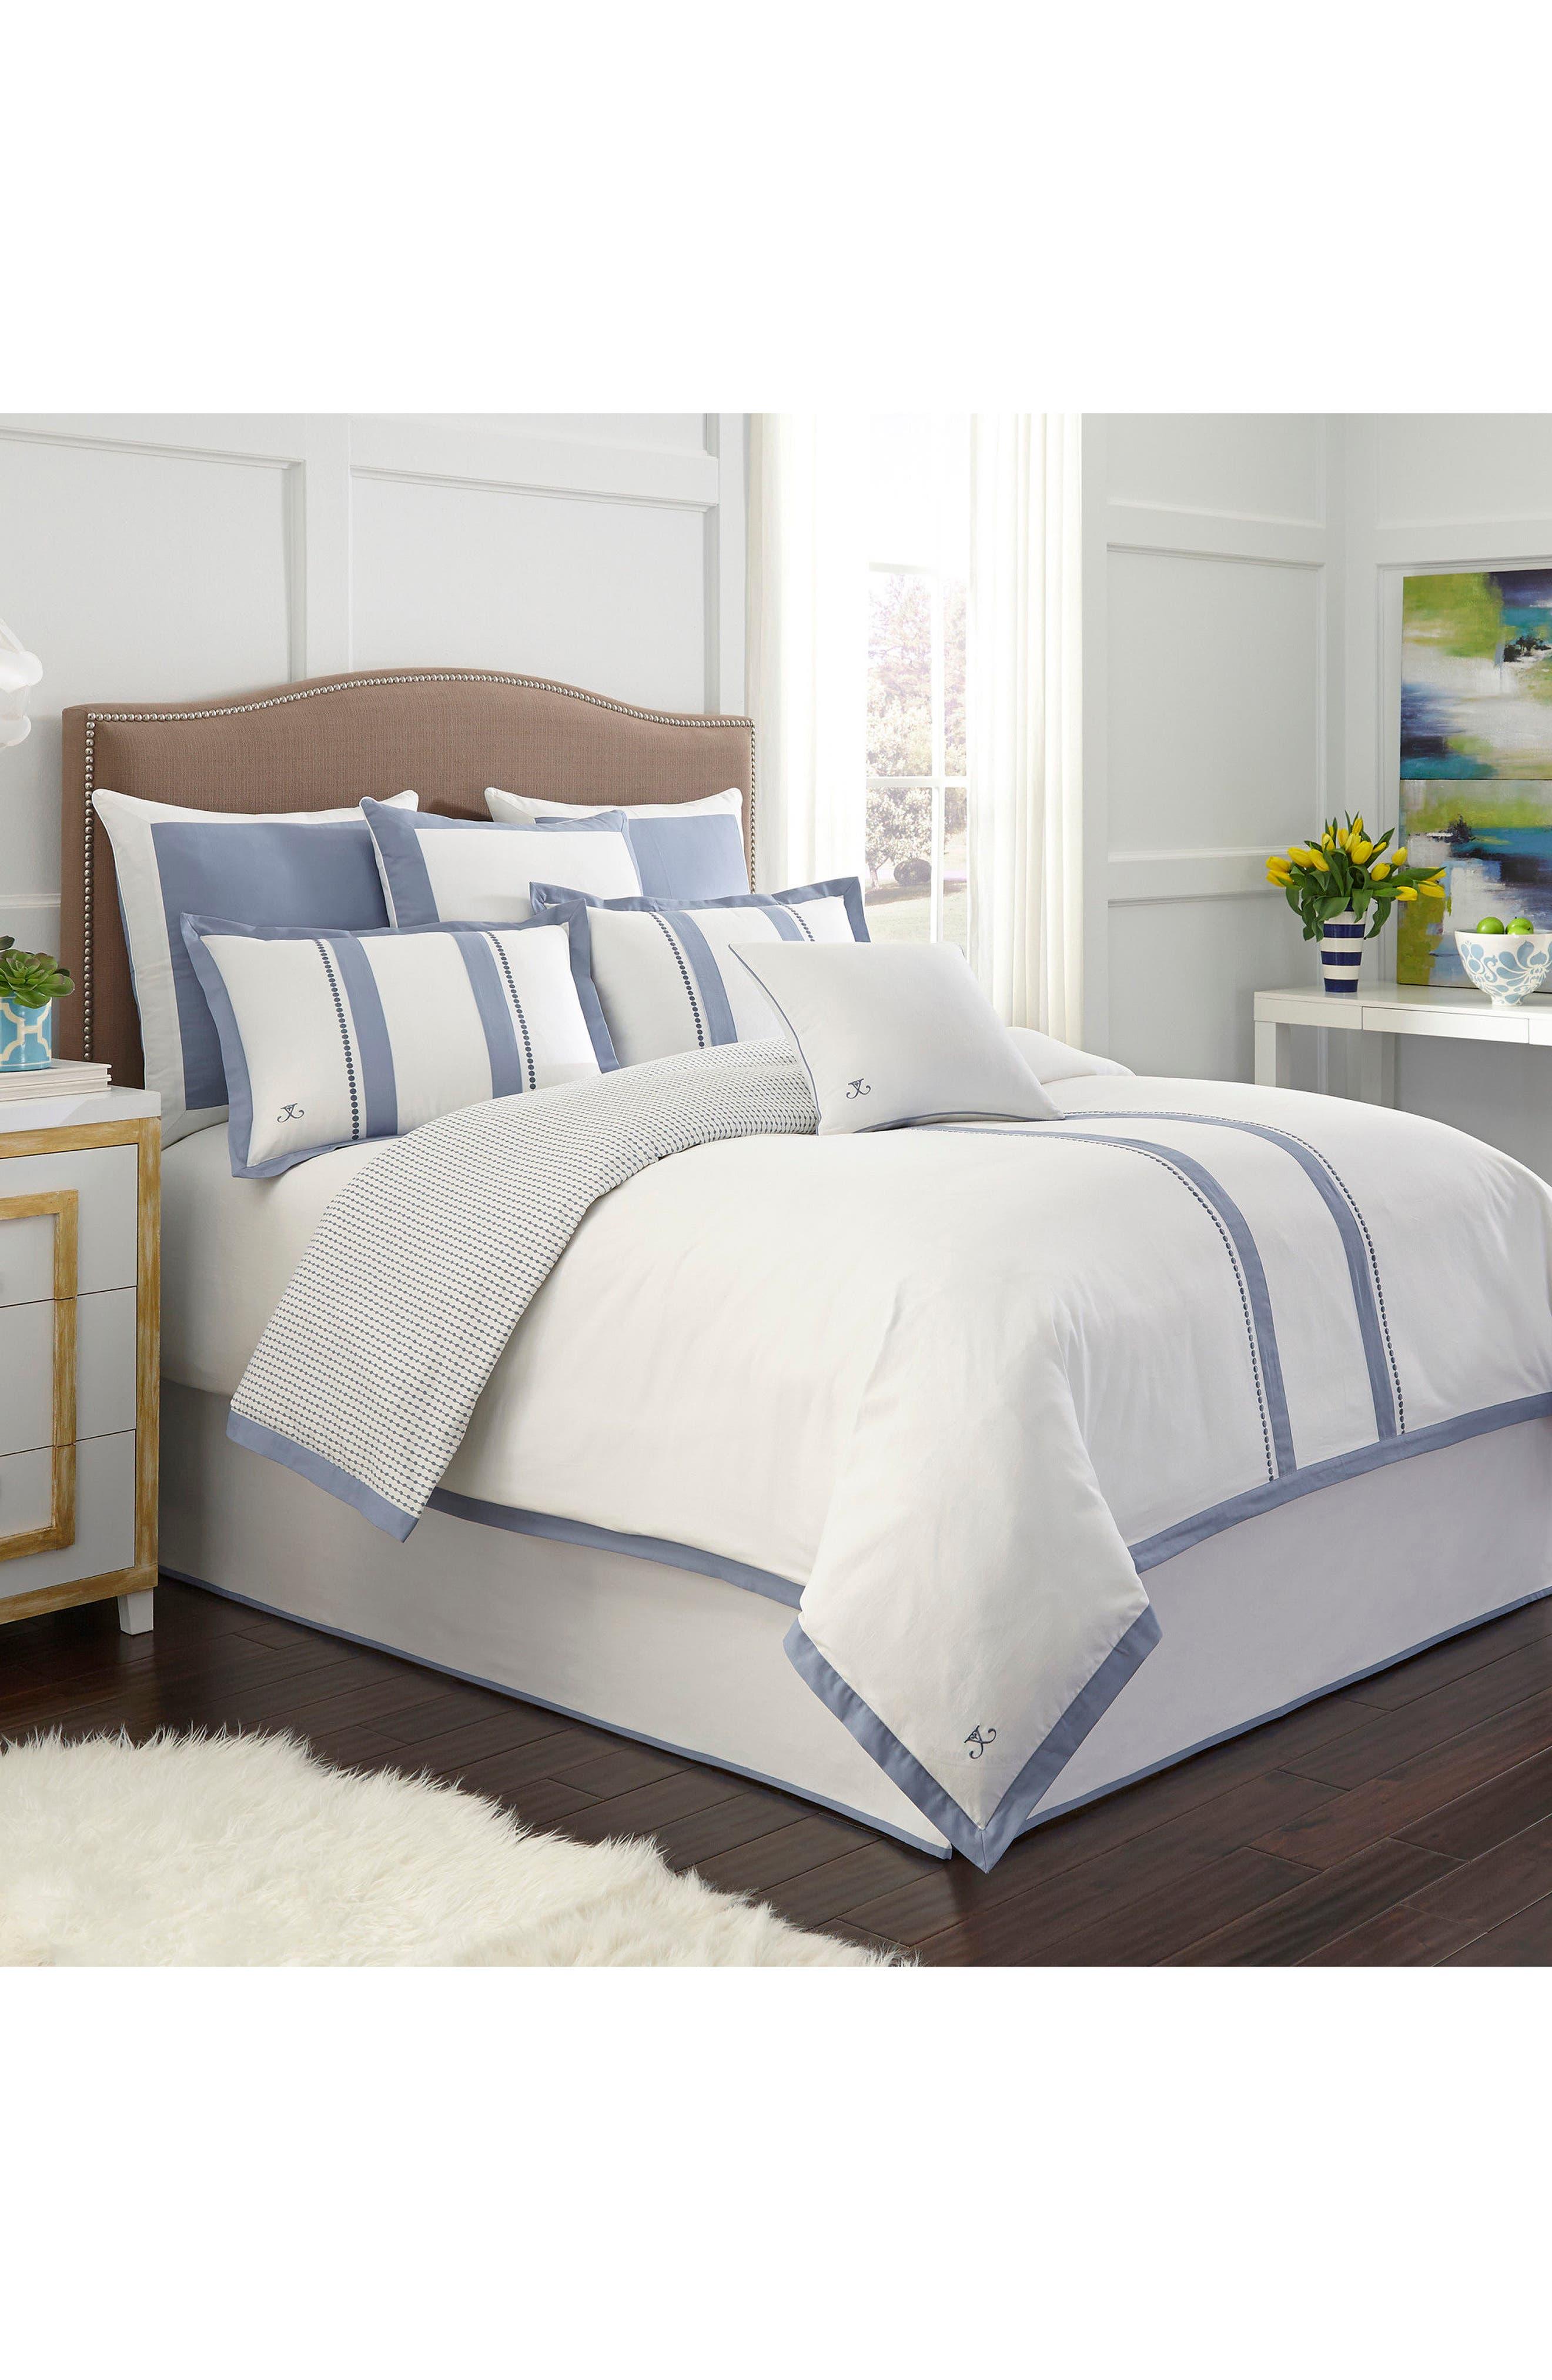 London Comforter,                         Main,                         color, White/ Blue